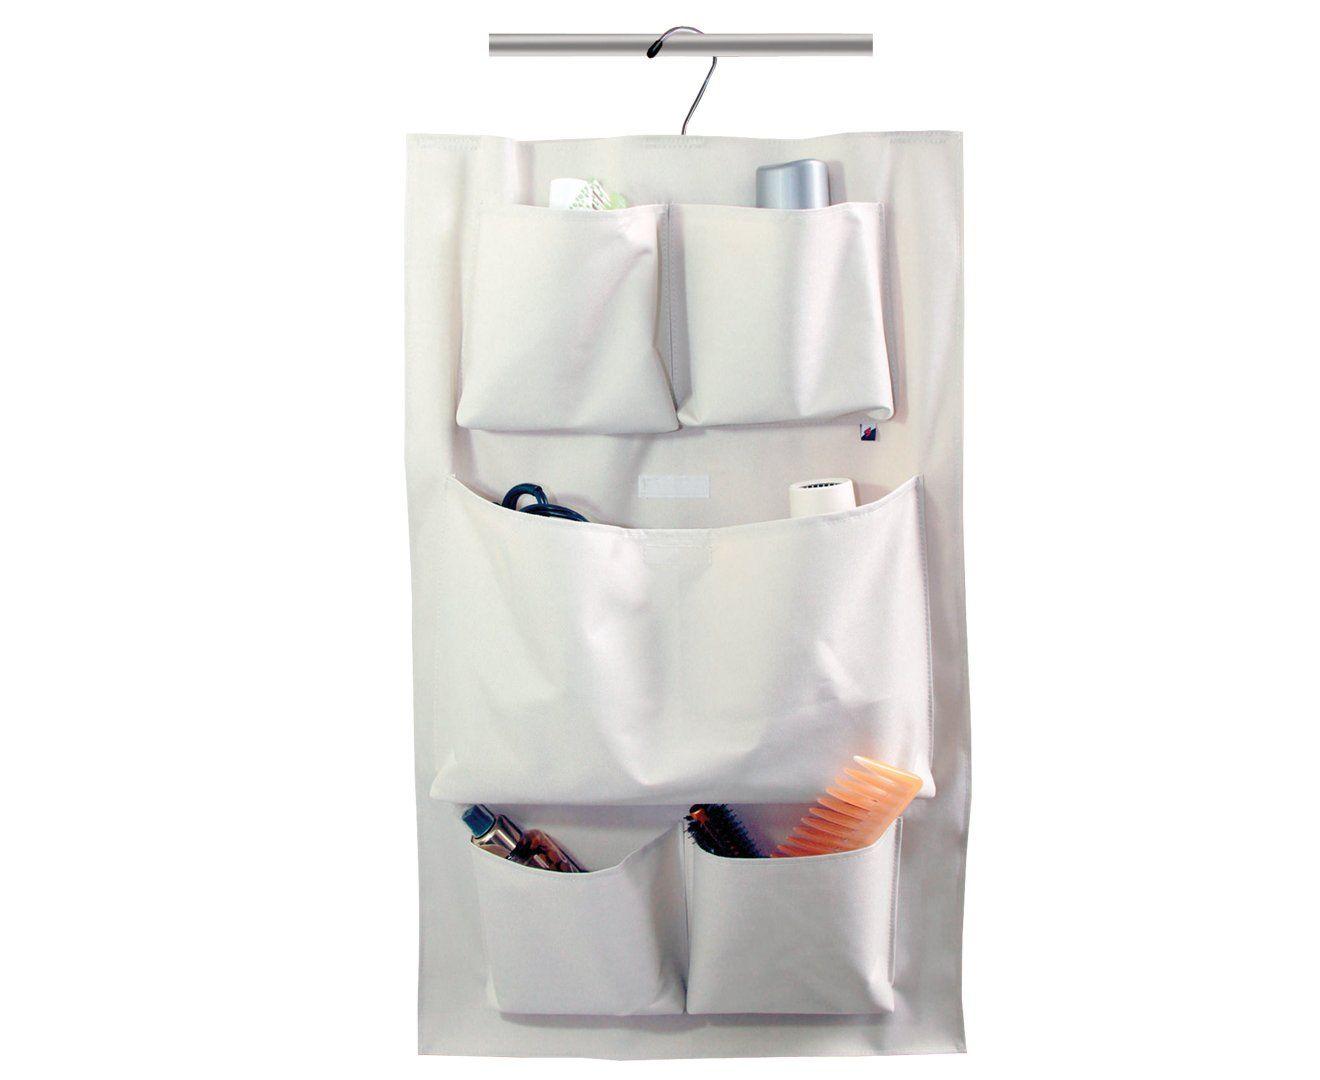 Cabide organizador com 5 bolsos banheiro organizadores - Organizador de carteras ...